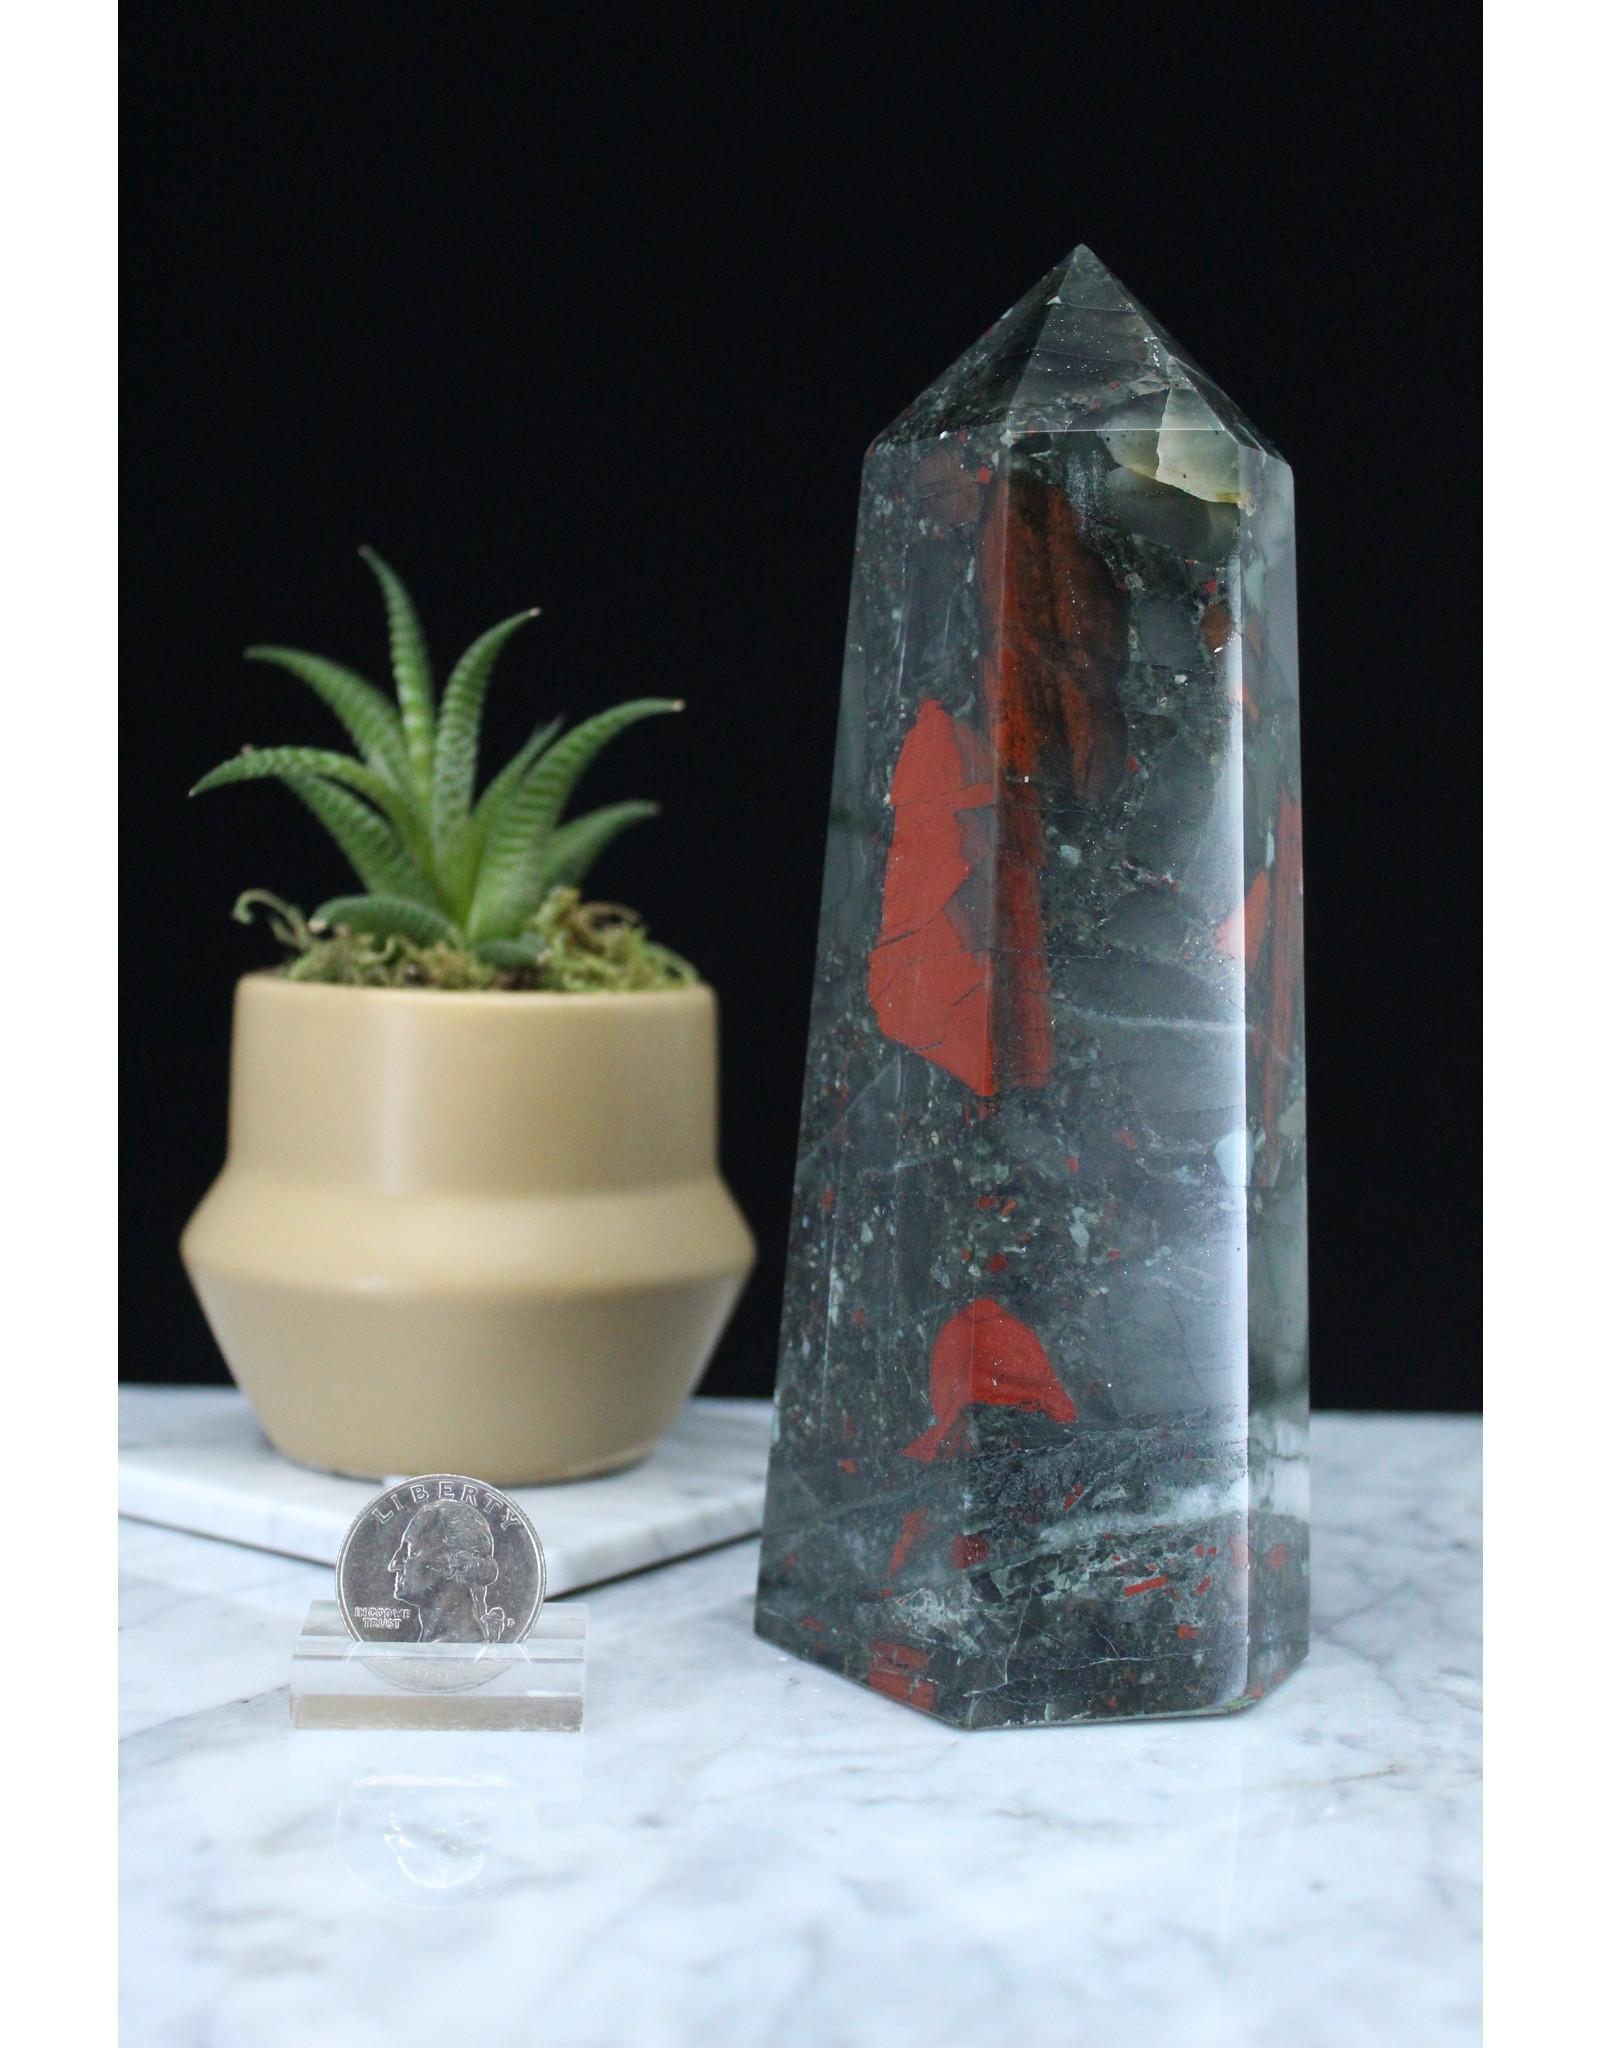 Bloodstone/Heliotrope Tower Point-XL